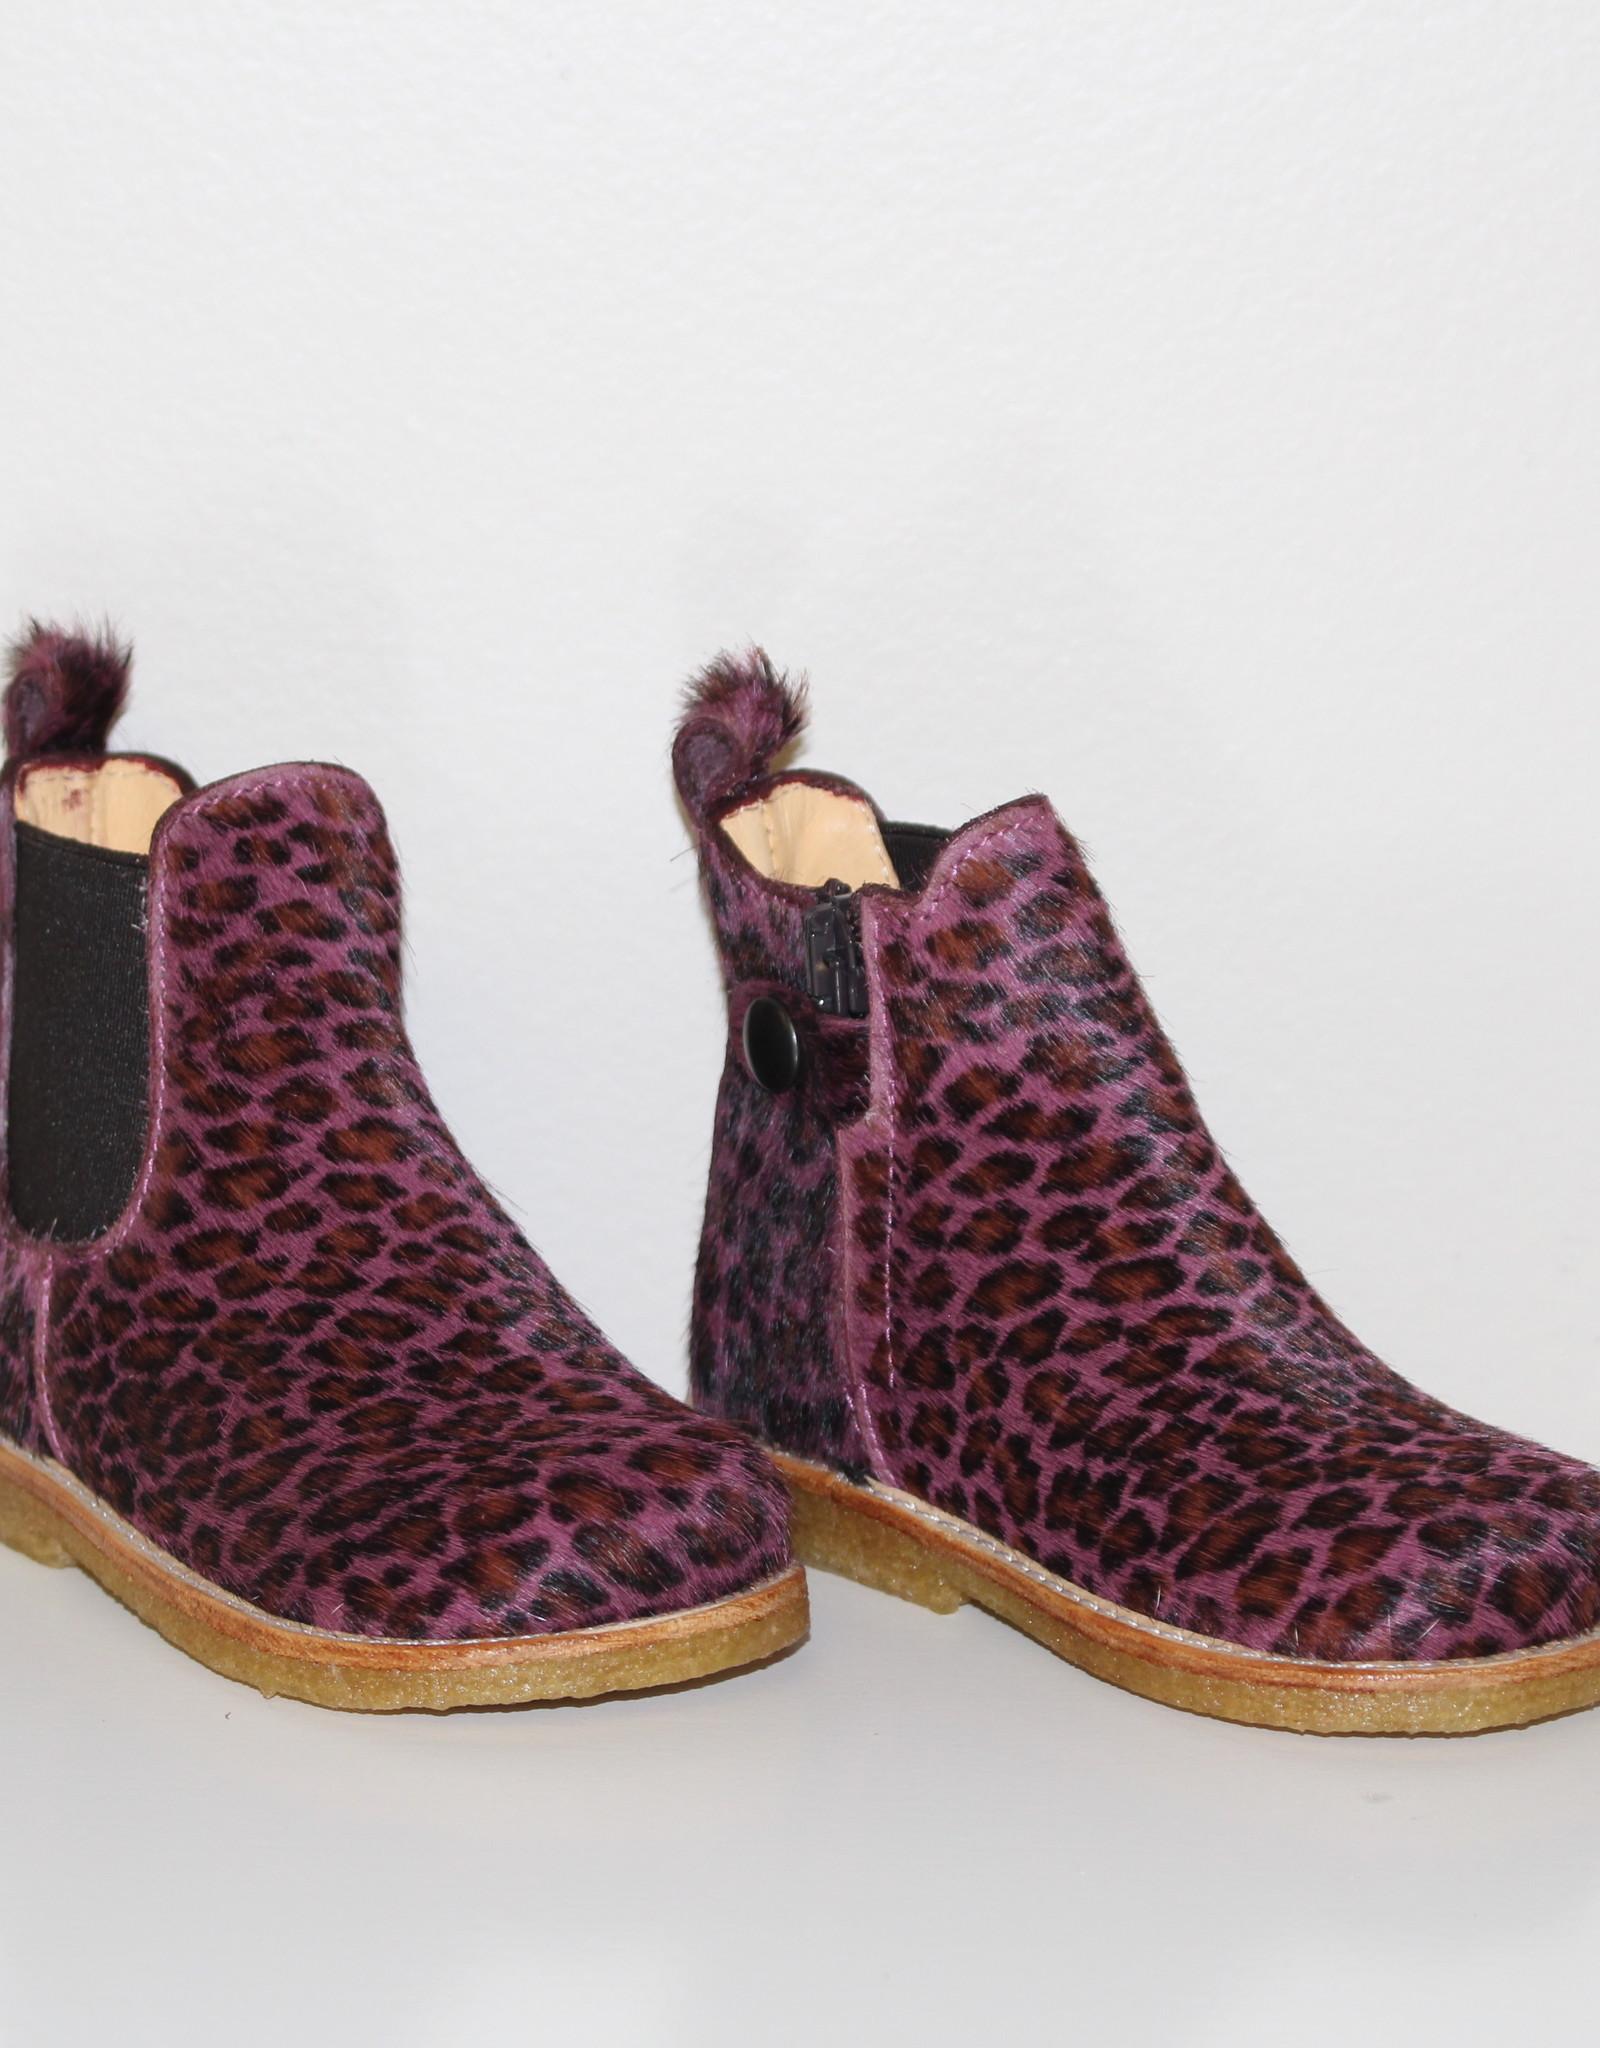 Angulus 6025-102 starter chelsea boot elastic rose leopard